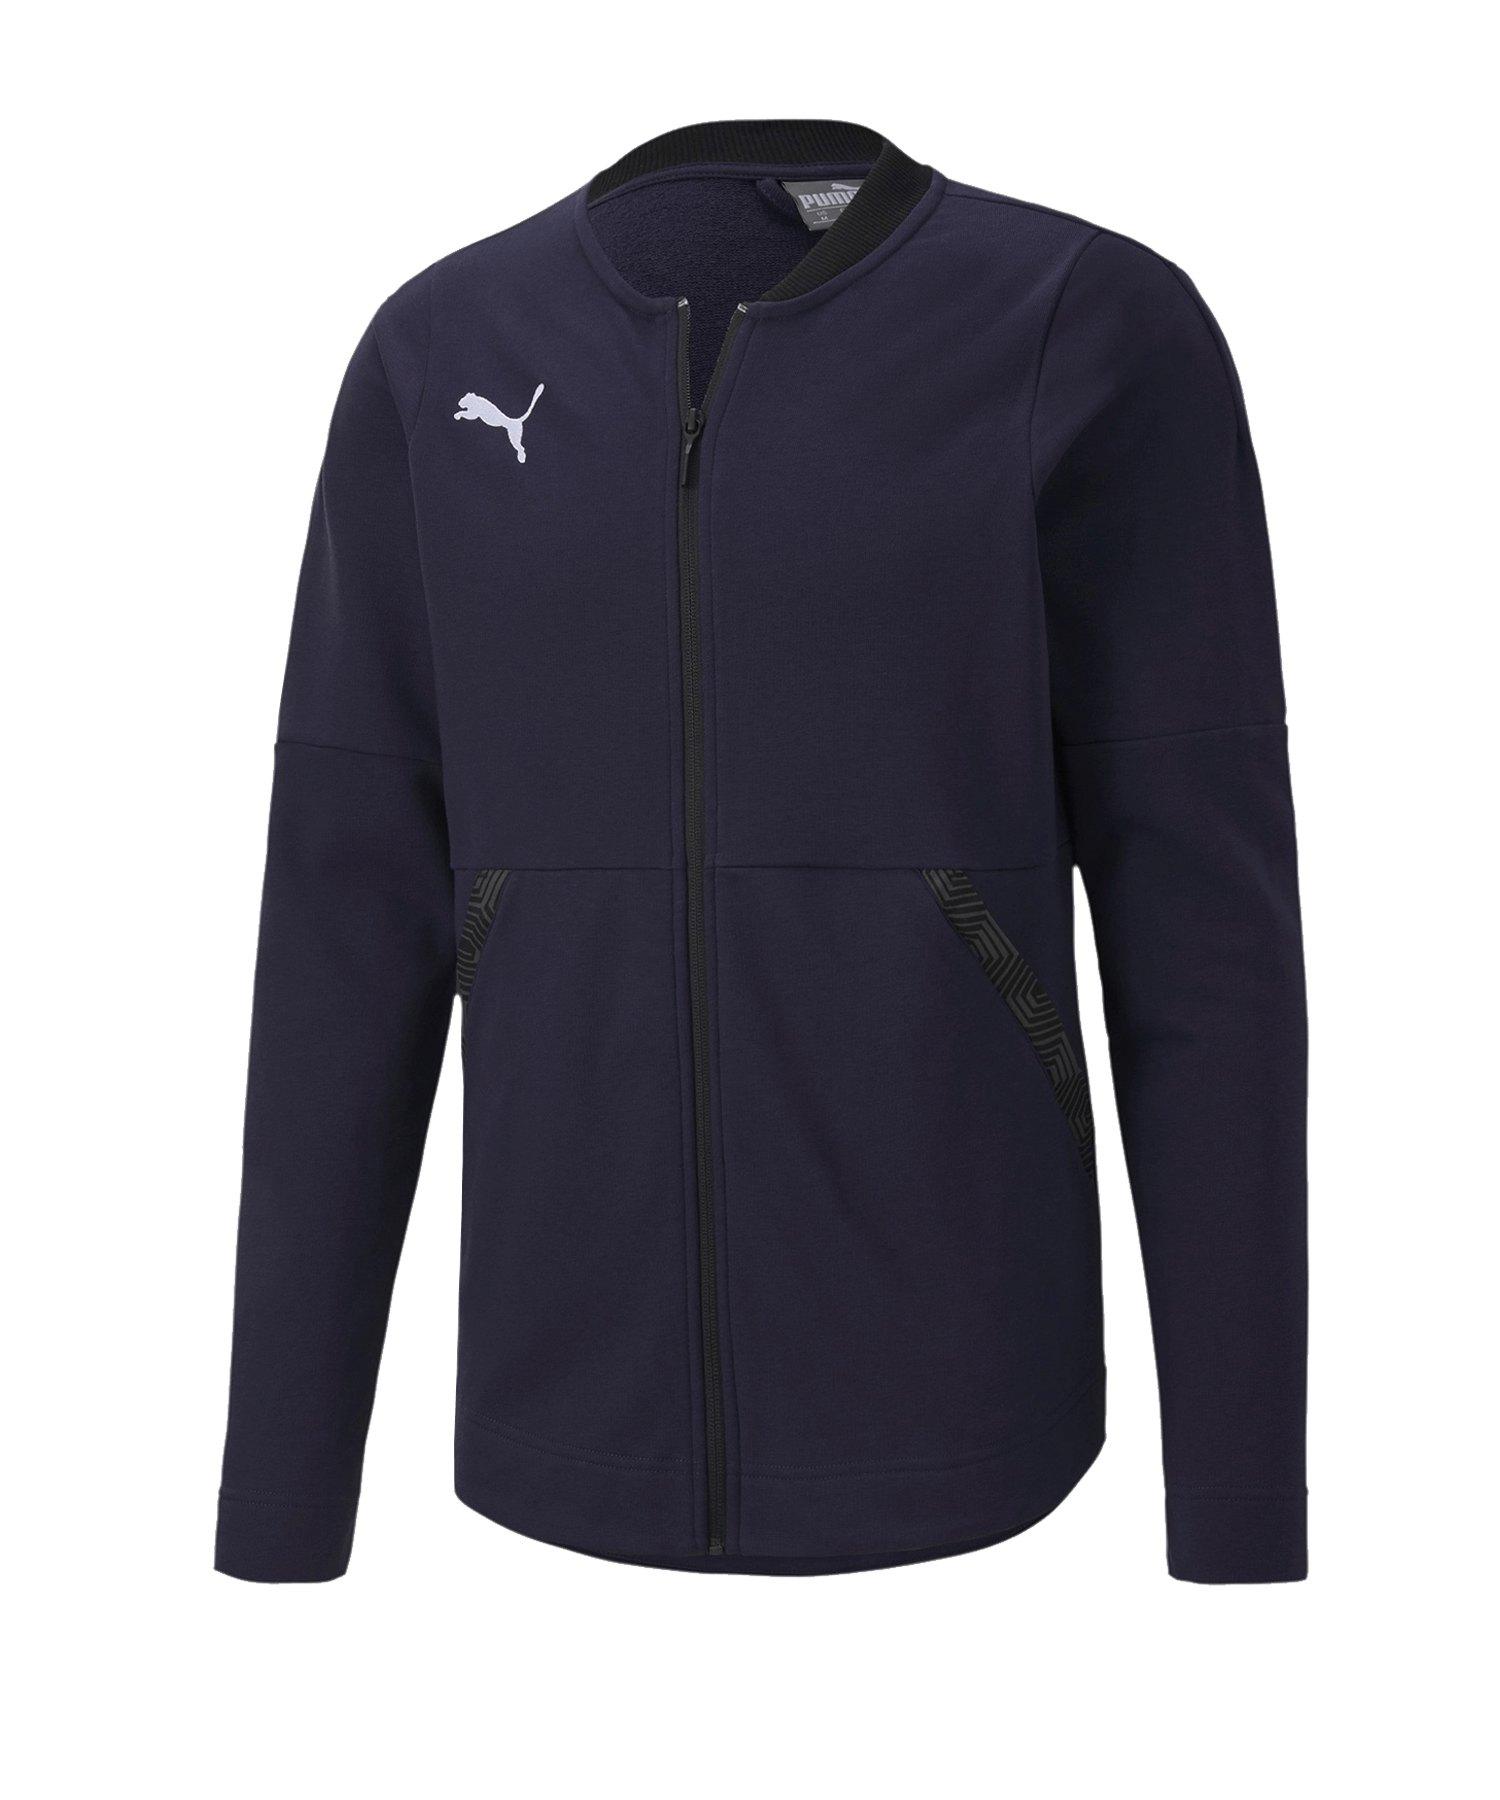 PUMA teamFINAL 21 Casuals Jacket Jacke Blau F06 - blau